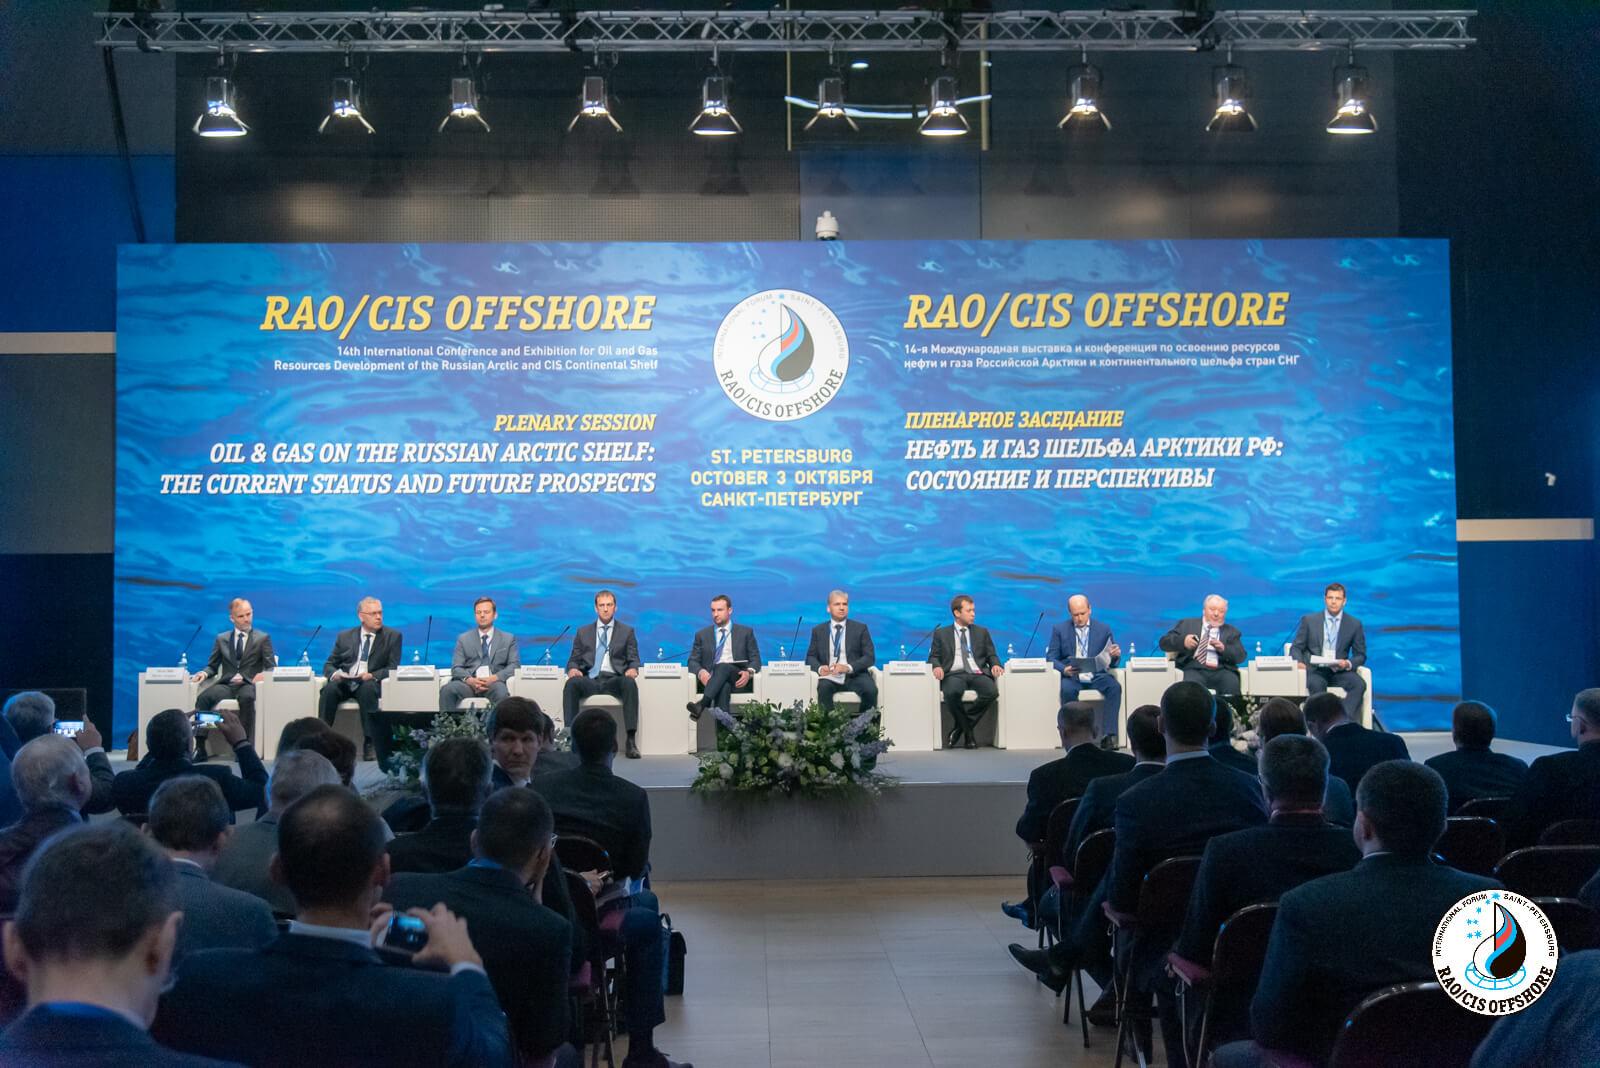 Пленарное заседание Форума RAO/CIS Offshore